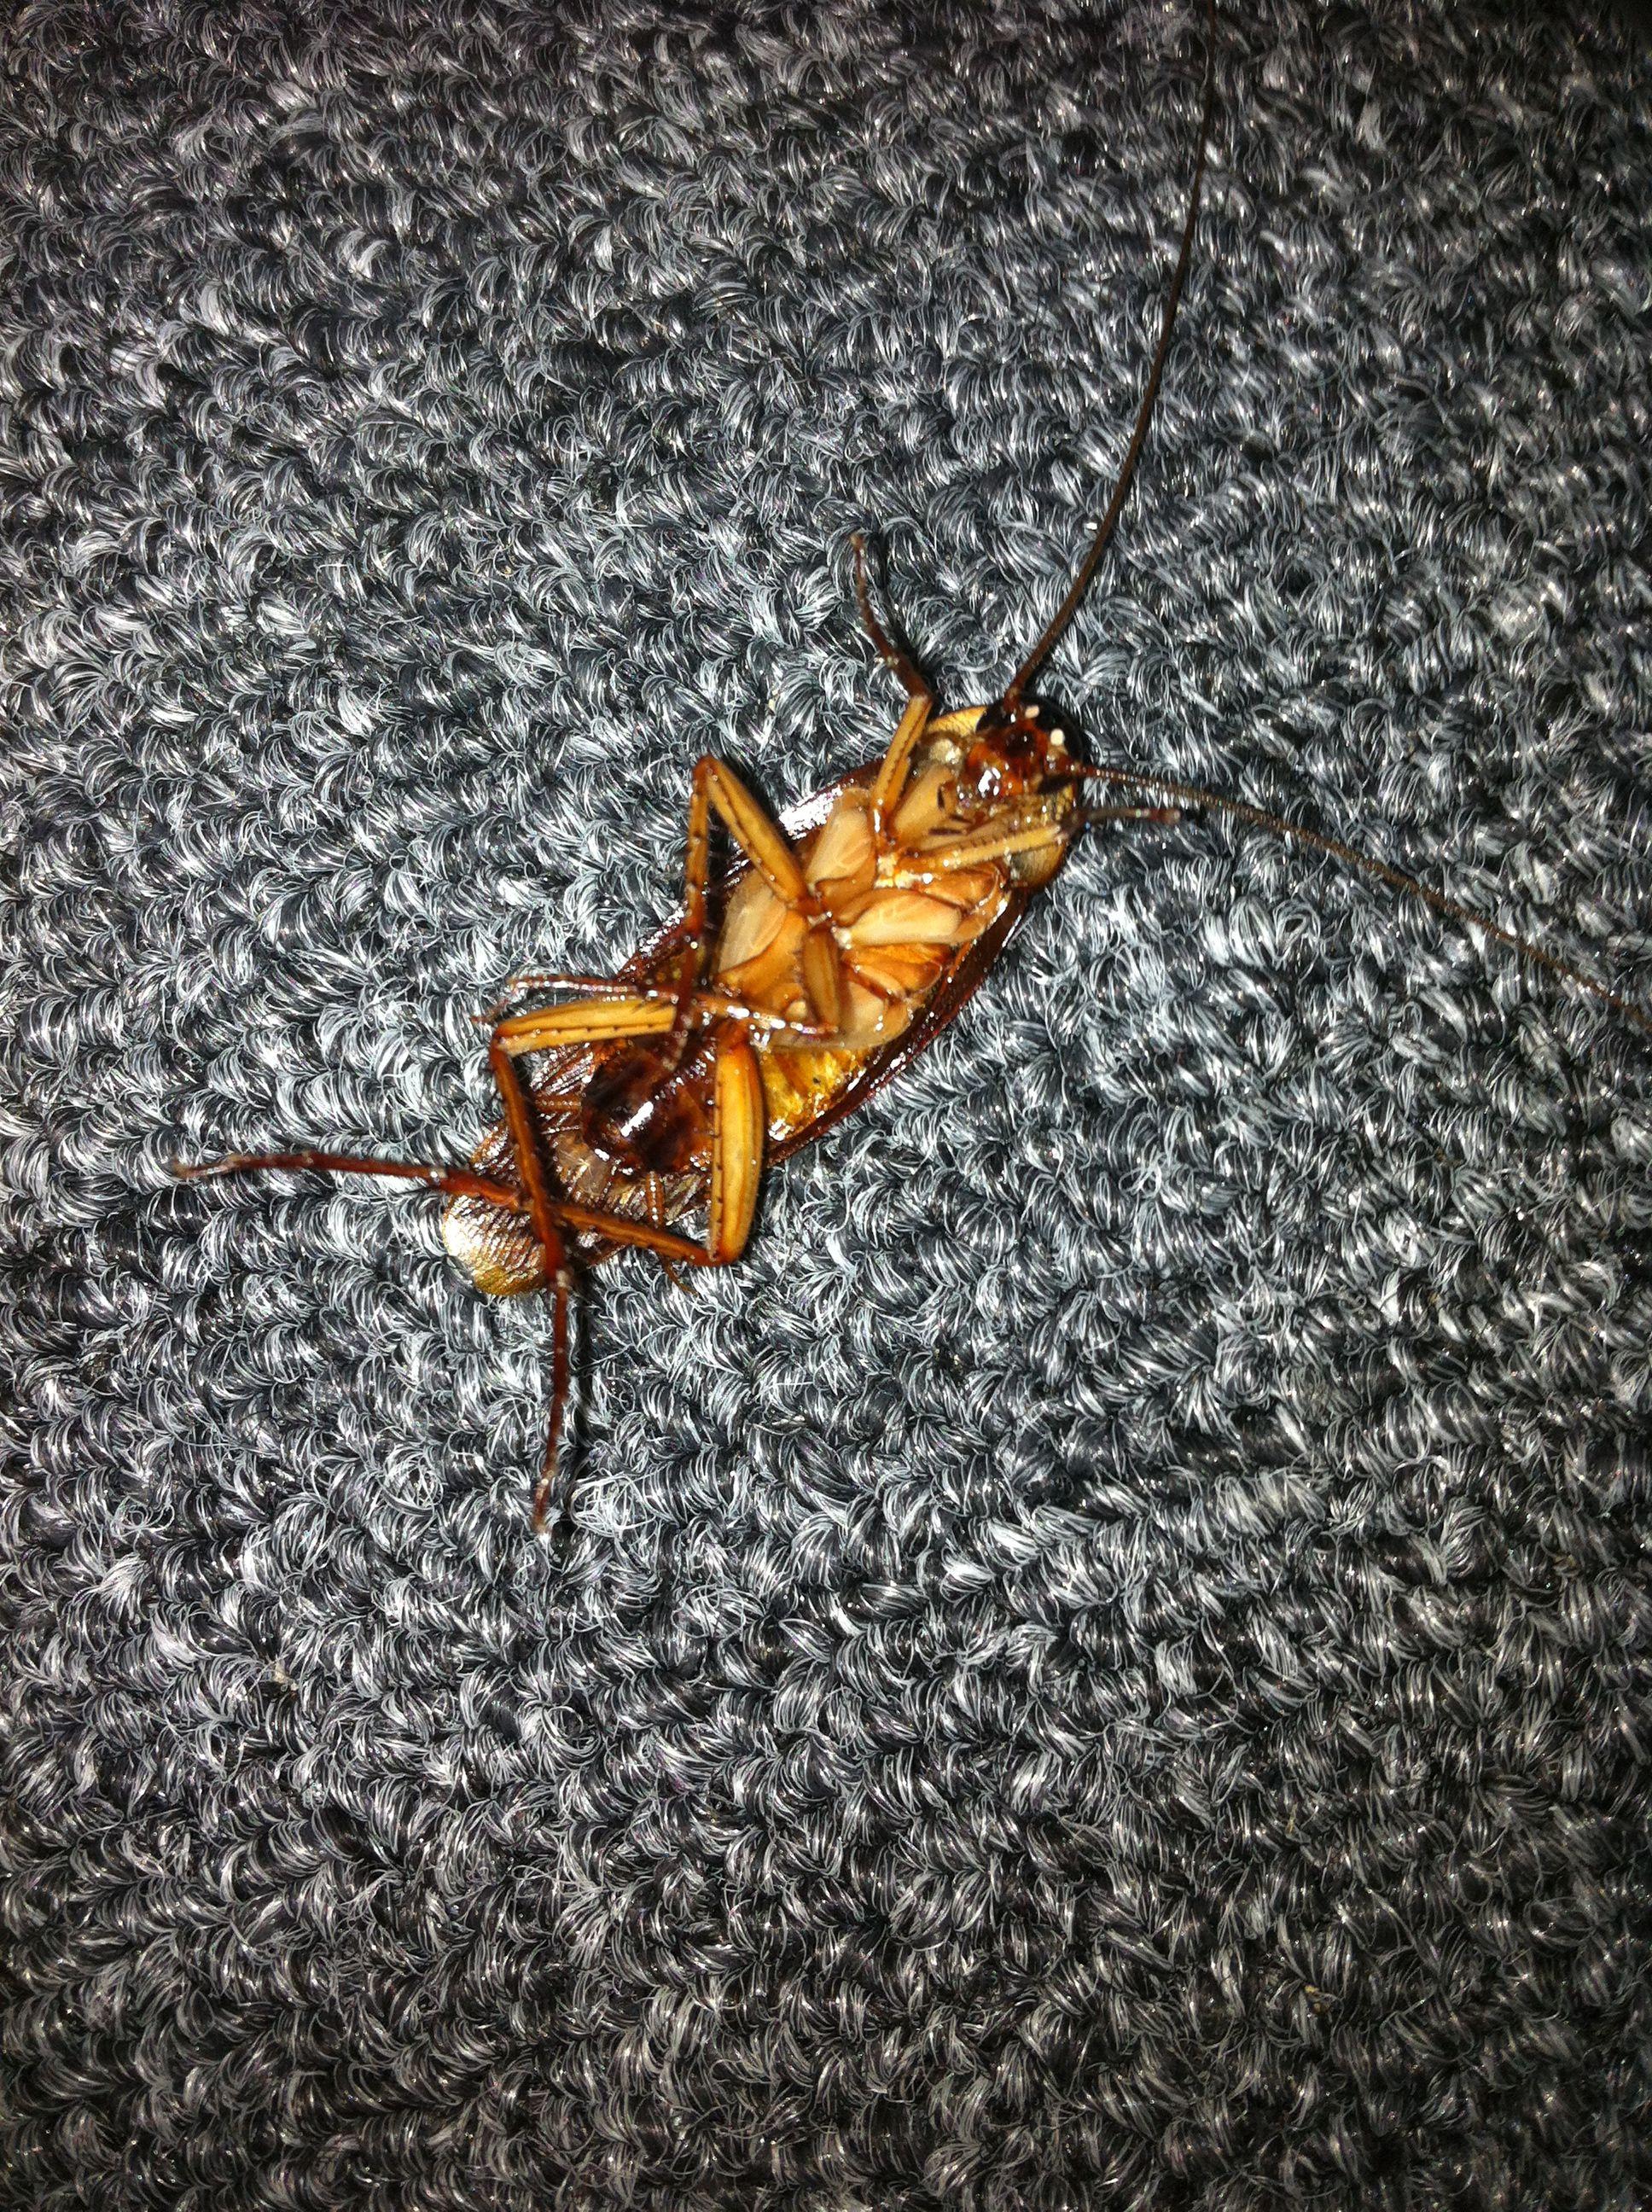 Roach found on 07/10/2013. Dead!